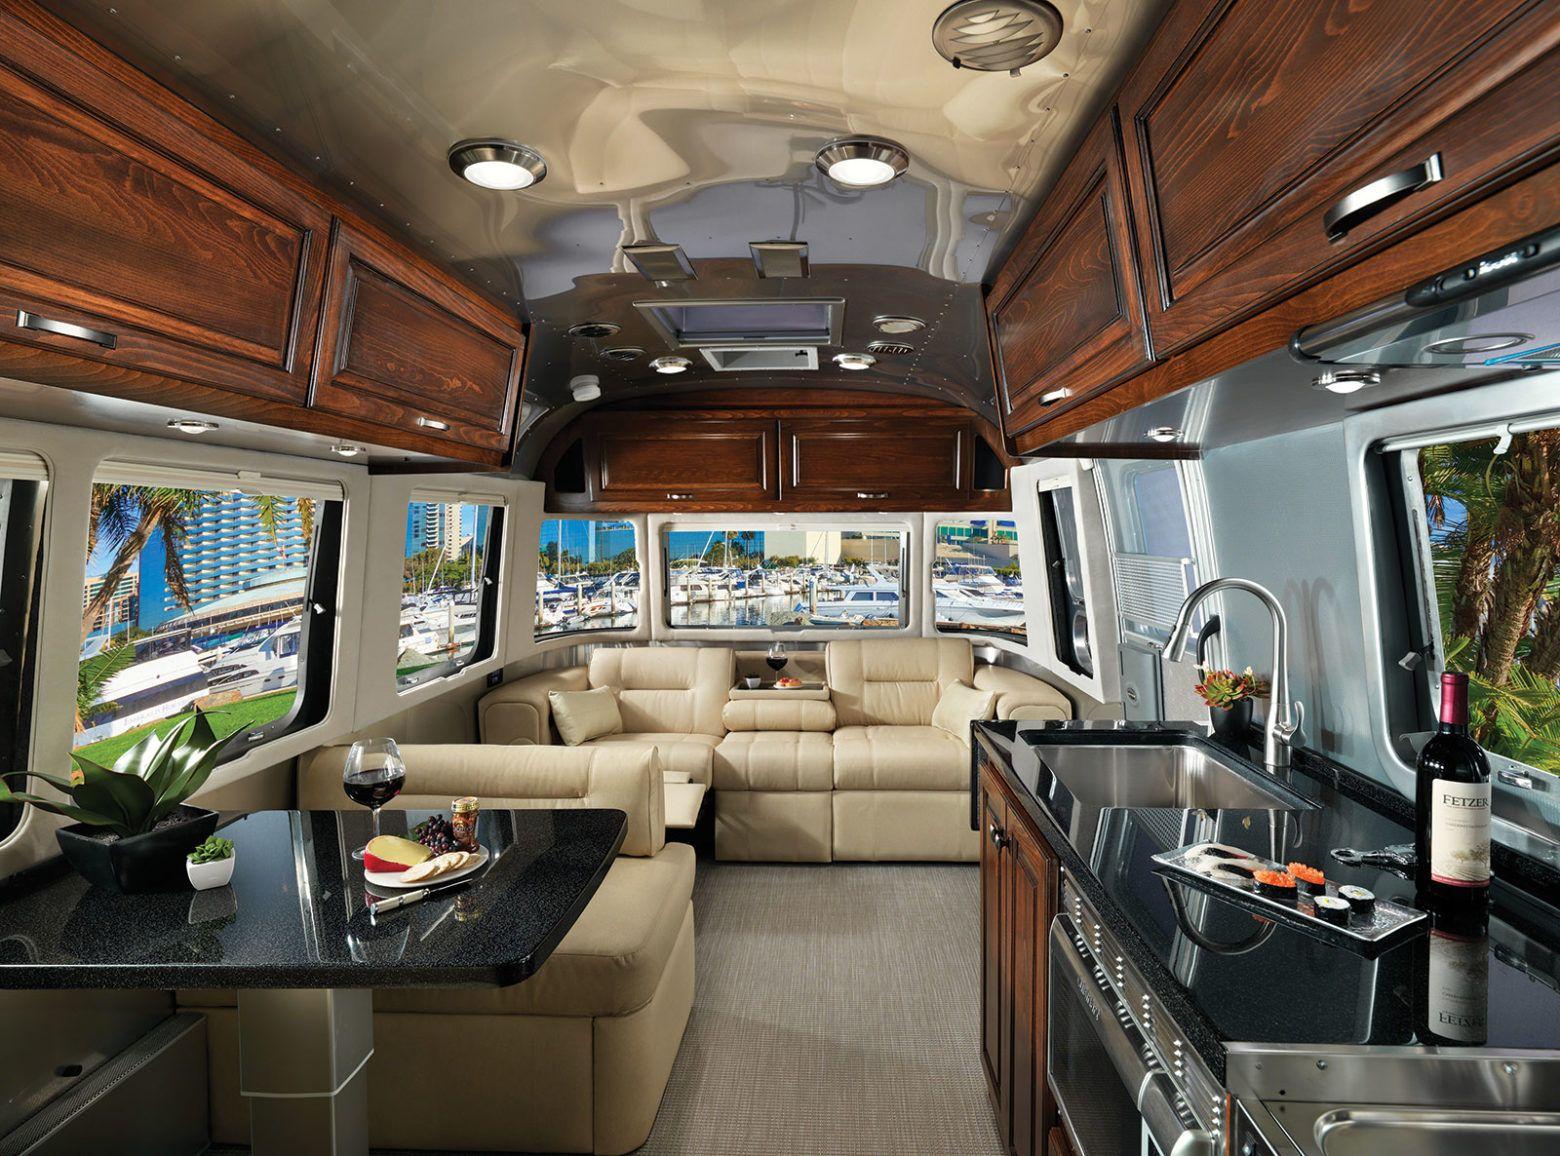 Airstream Travel Trailer Interiors - Luxury Travel ...